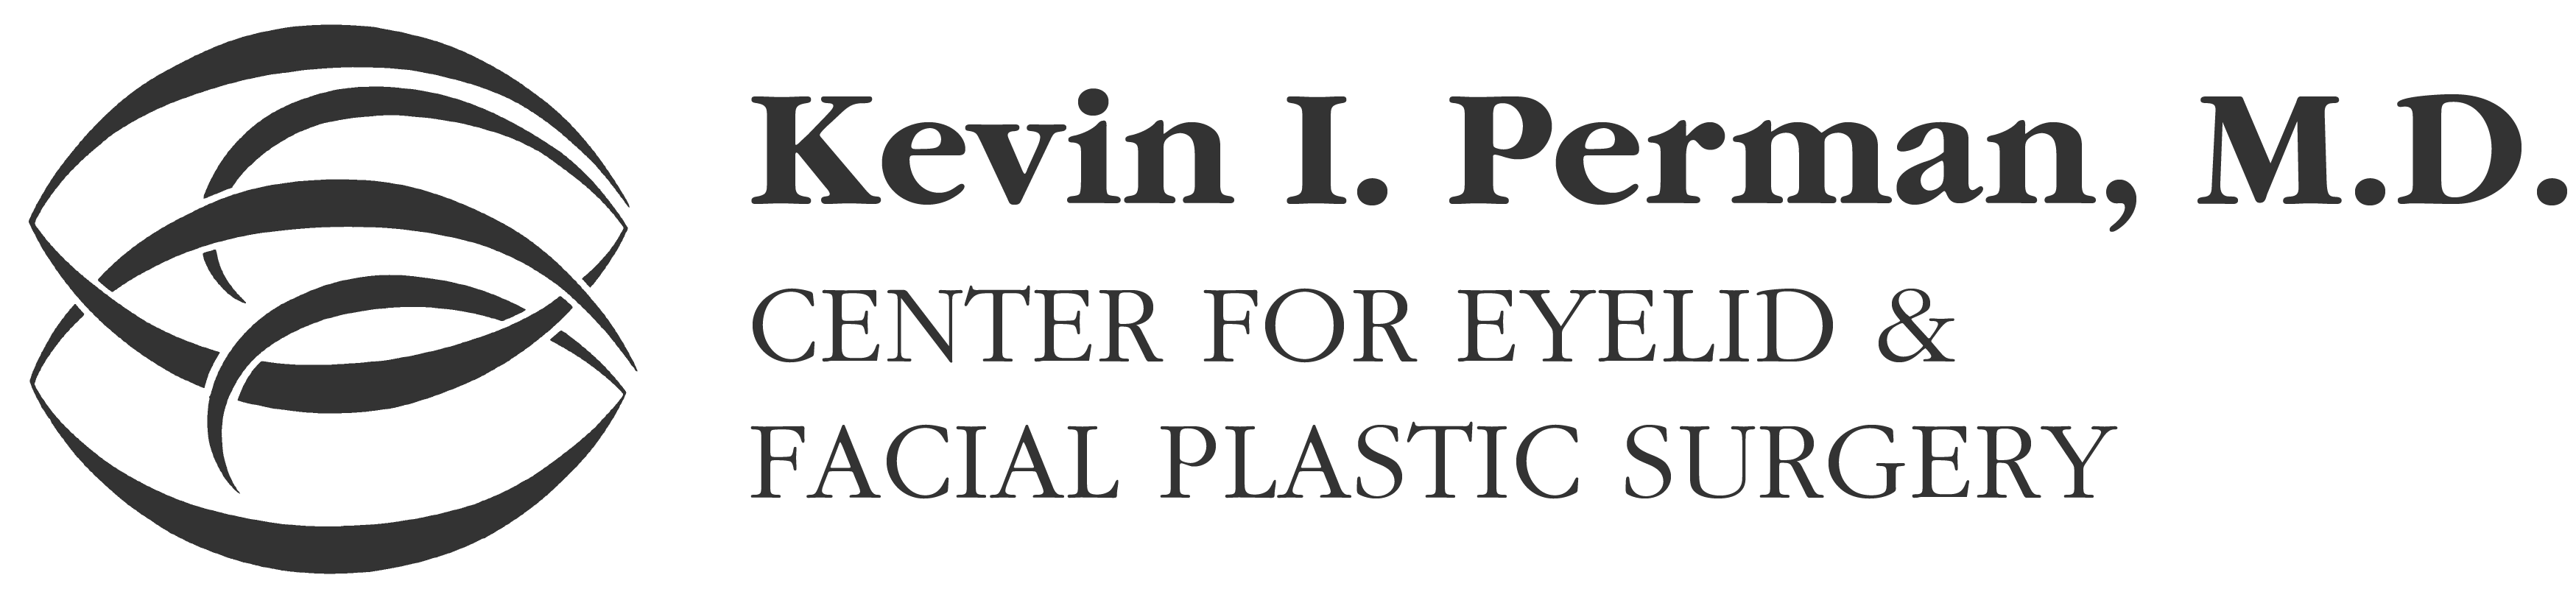 Dr. Kevin I. Perman, MD - Washington, DC 20006 - (202)615-5525 | ShowMeLocal.com